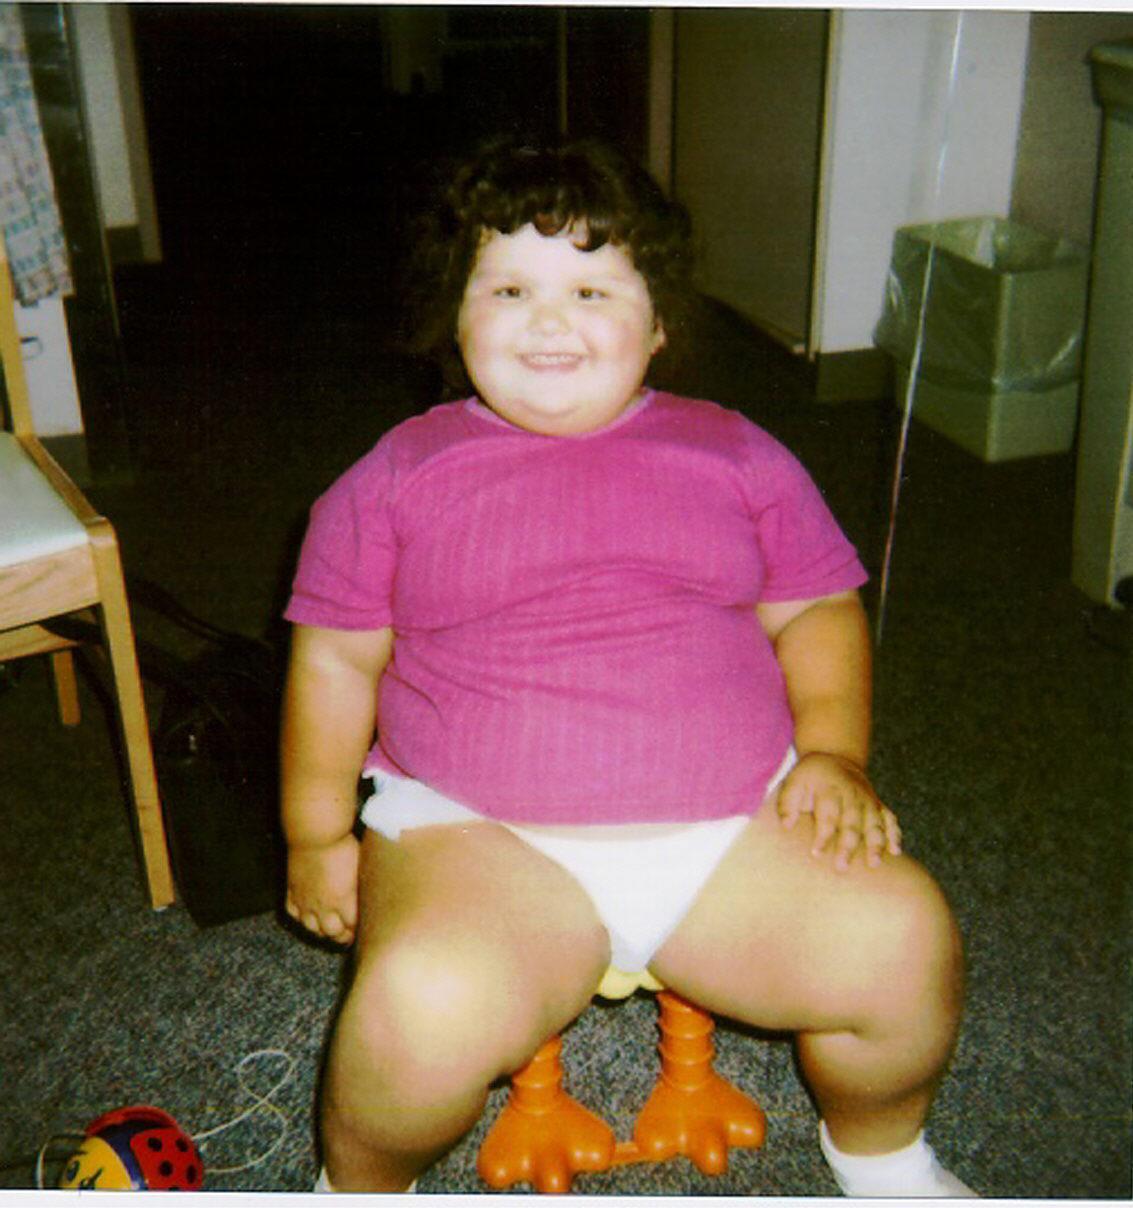 http://cienciaaldia.files.wordpress.com/2009/06/cada_ano_diagnostican_obesidad_a_400_000_ninos_de_la_ue_originalarticleimage.jpg